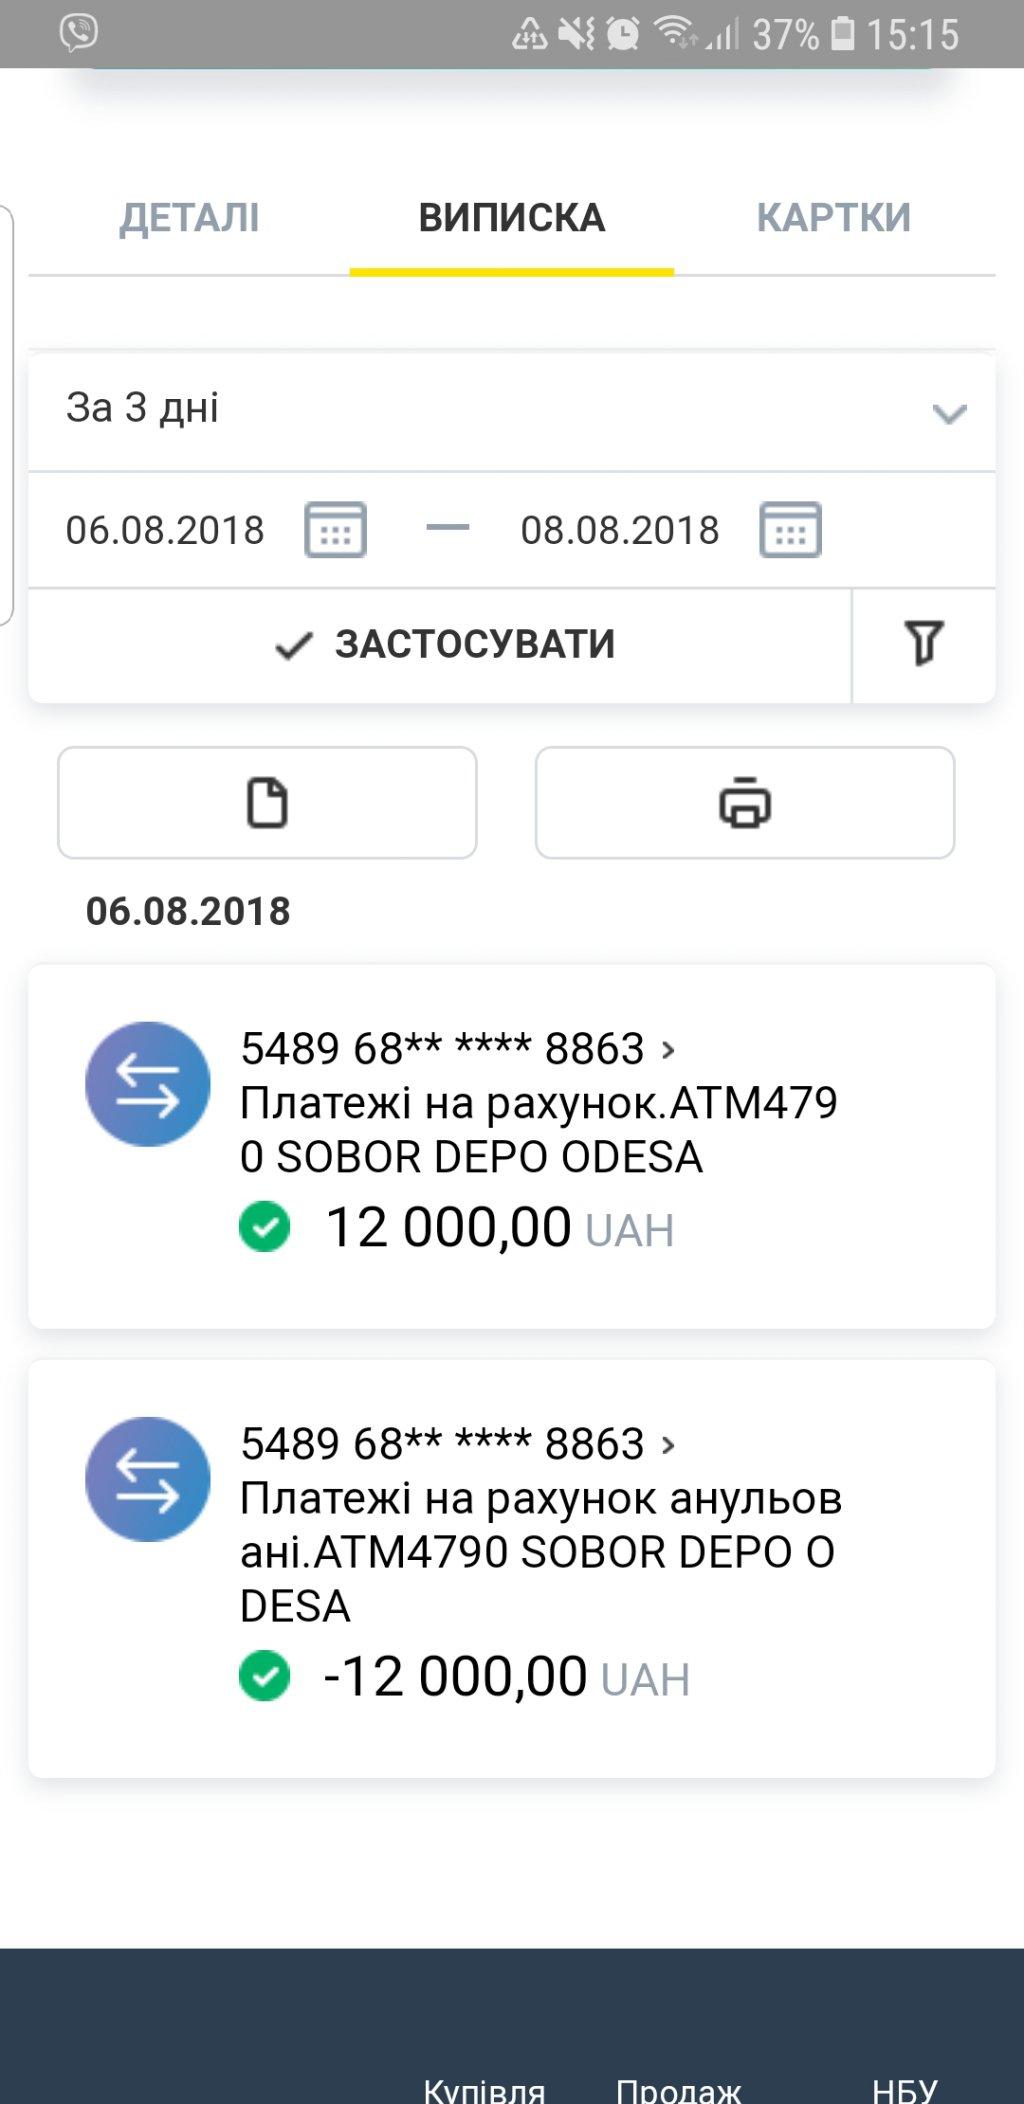 взять кредит в райффайзен банк аваль онлайн capital one credit card mailing status